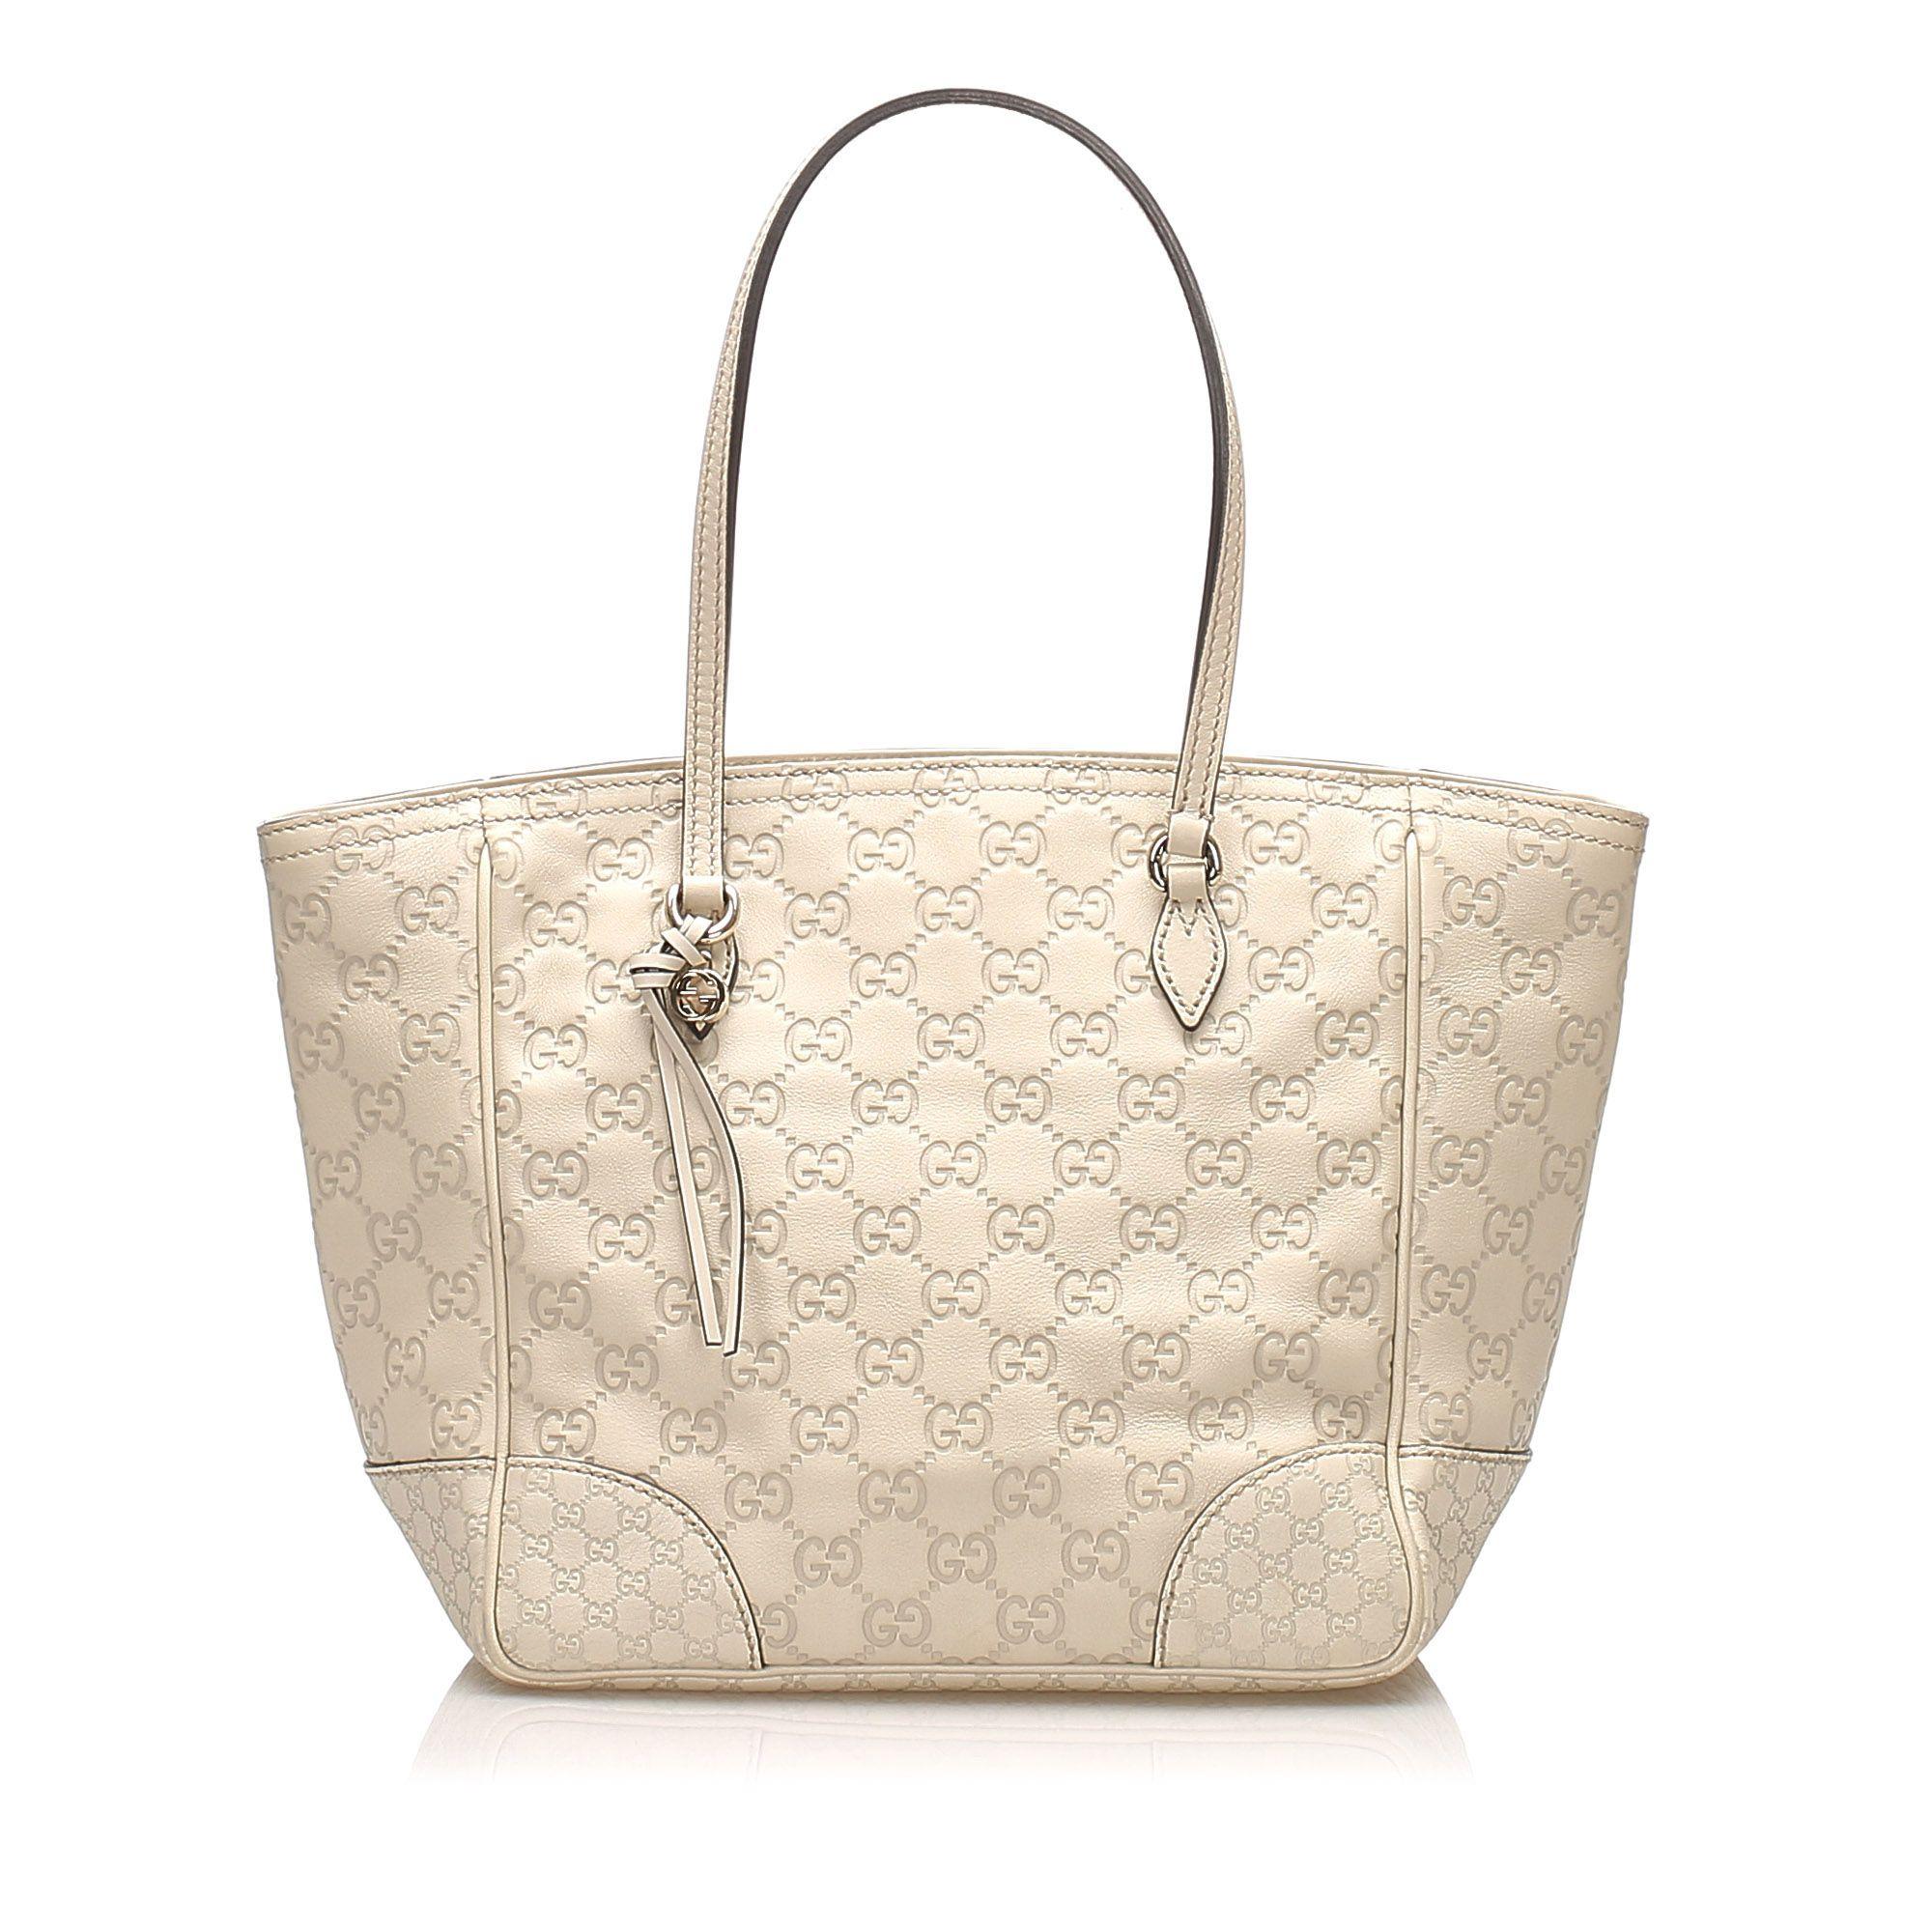 Vintage Gucci Guccissima Bree Leather Tote Bag Brown